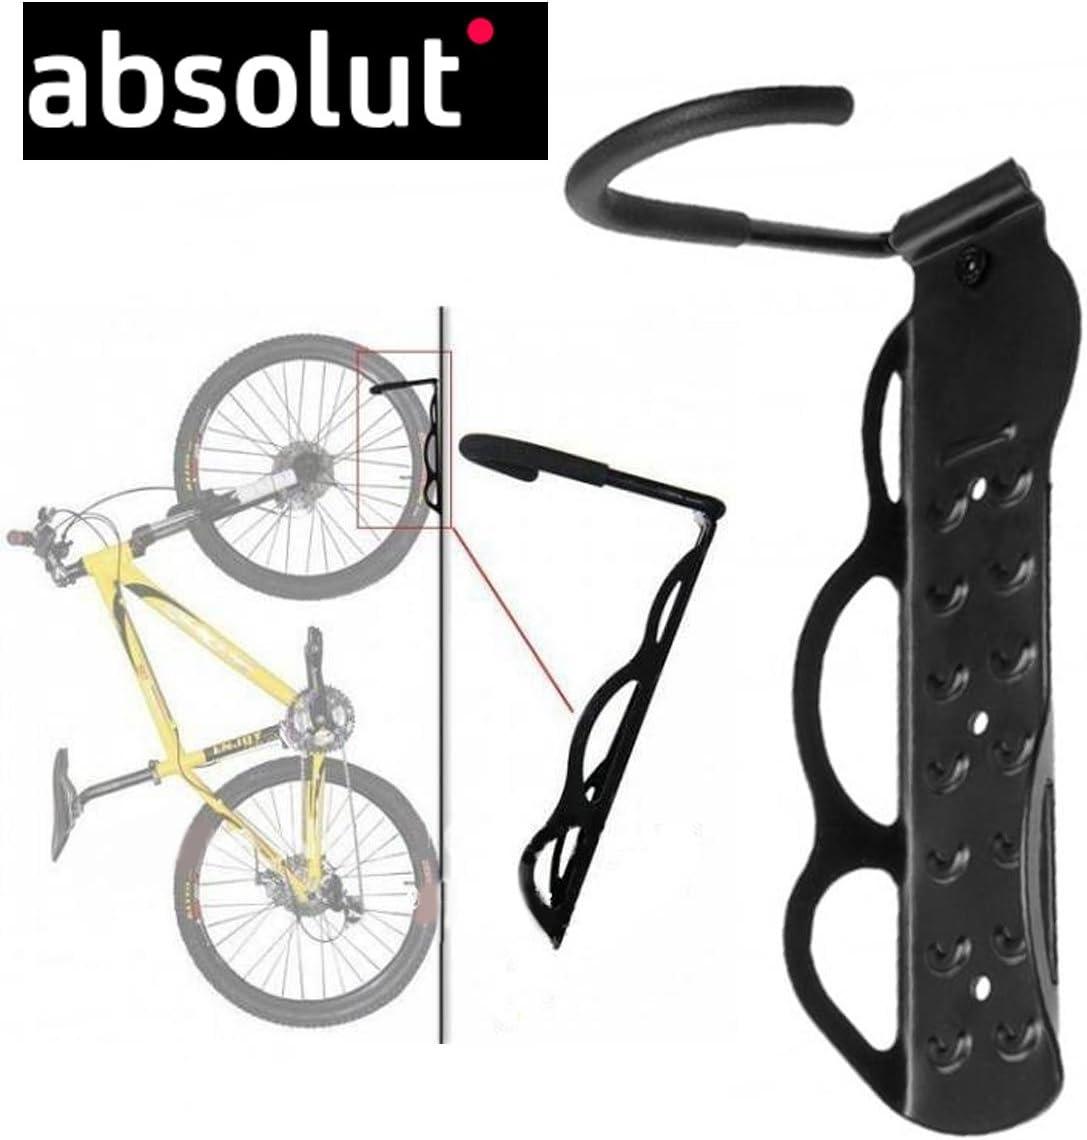 stand soporte pared colgador bici bicicleta Absolut acero + ...